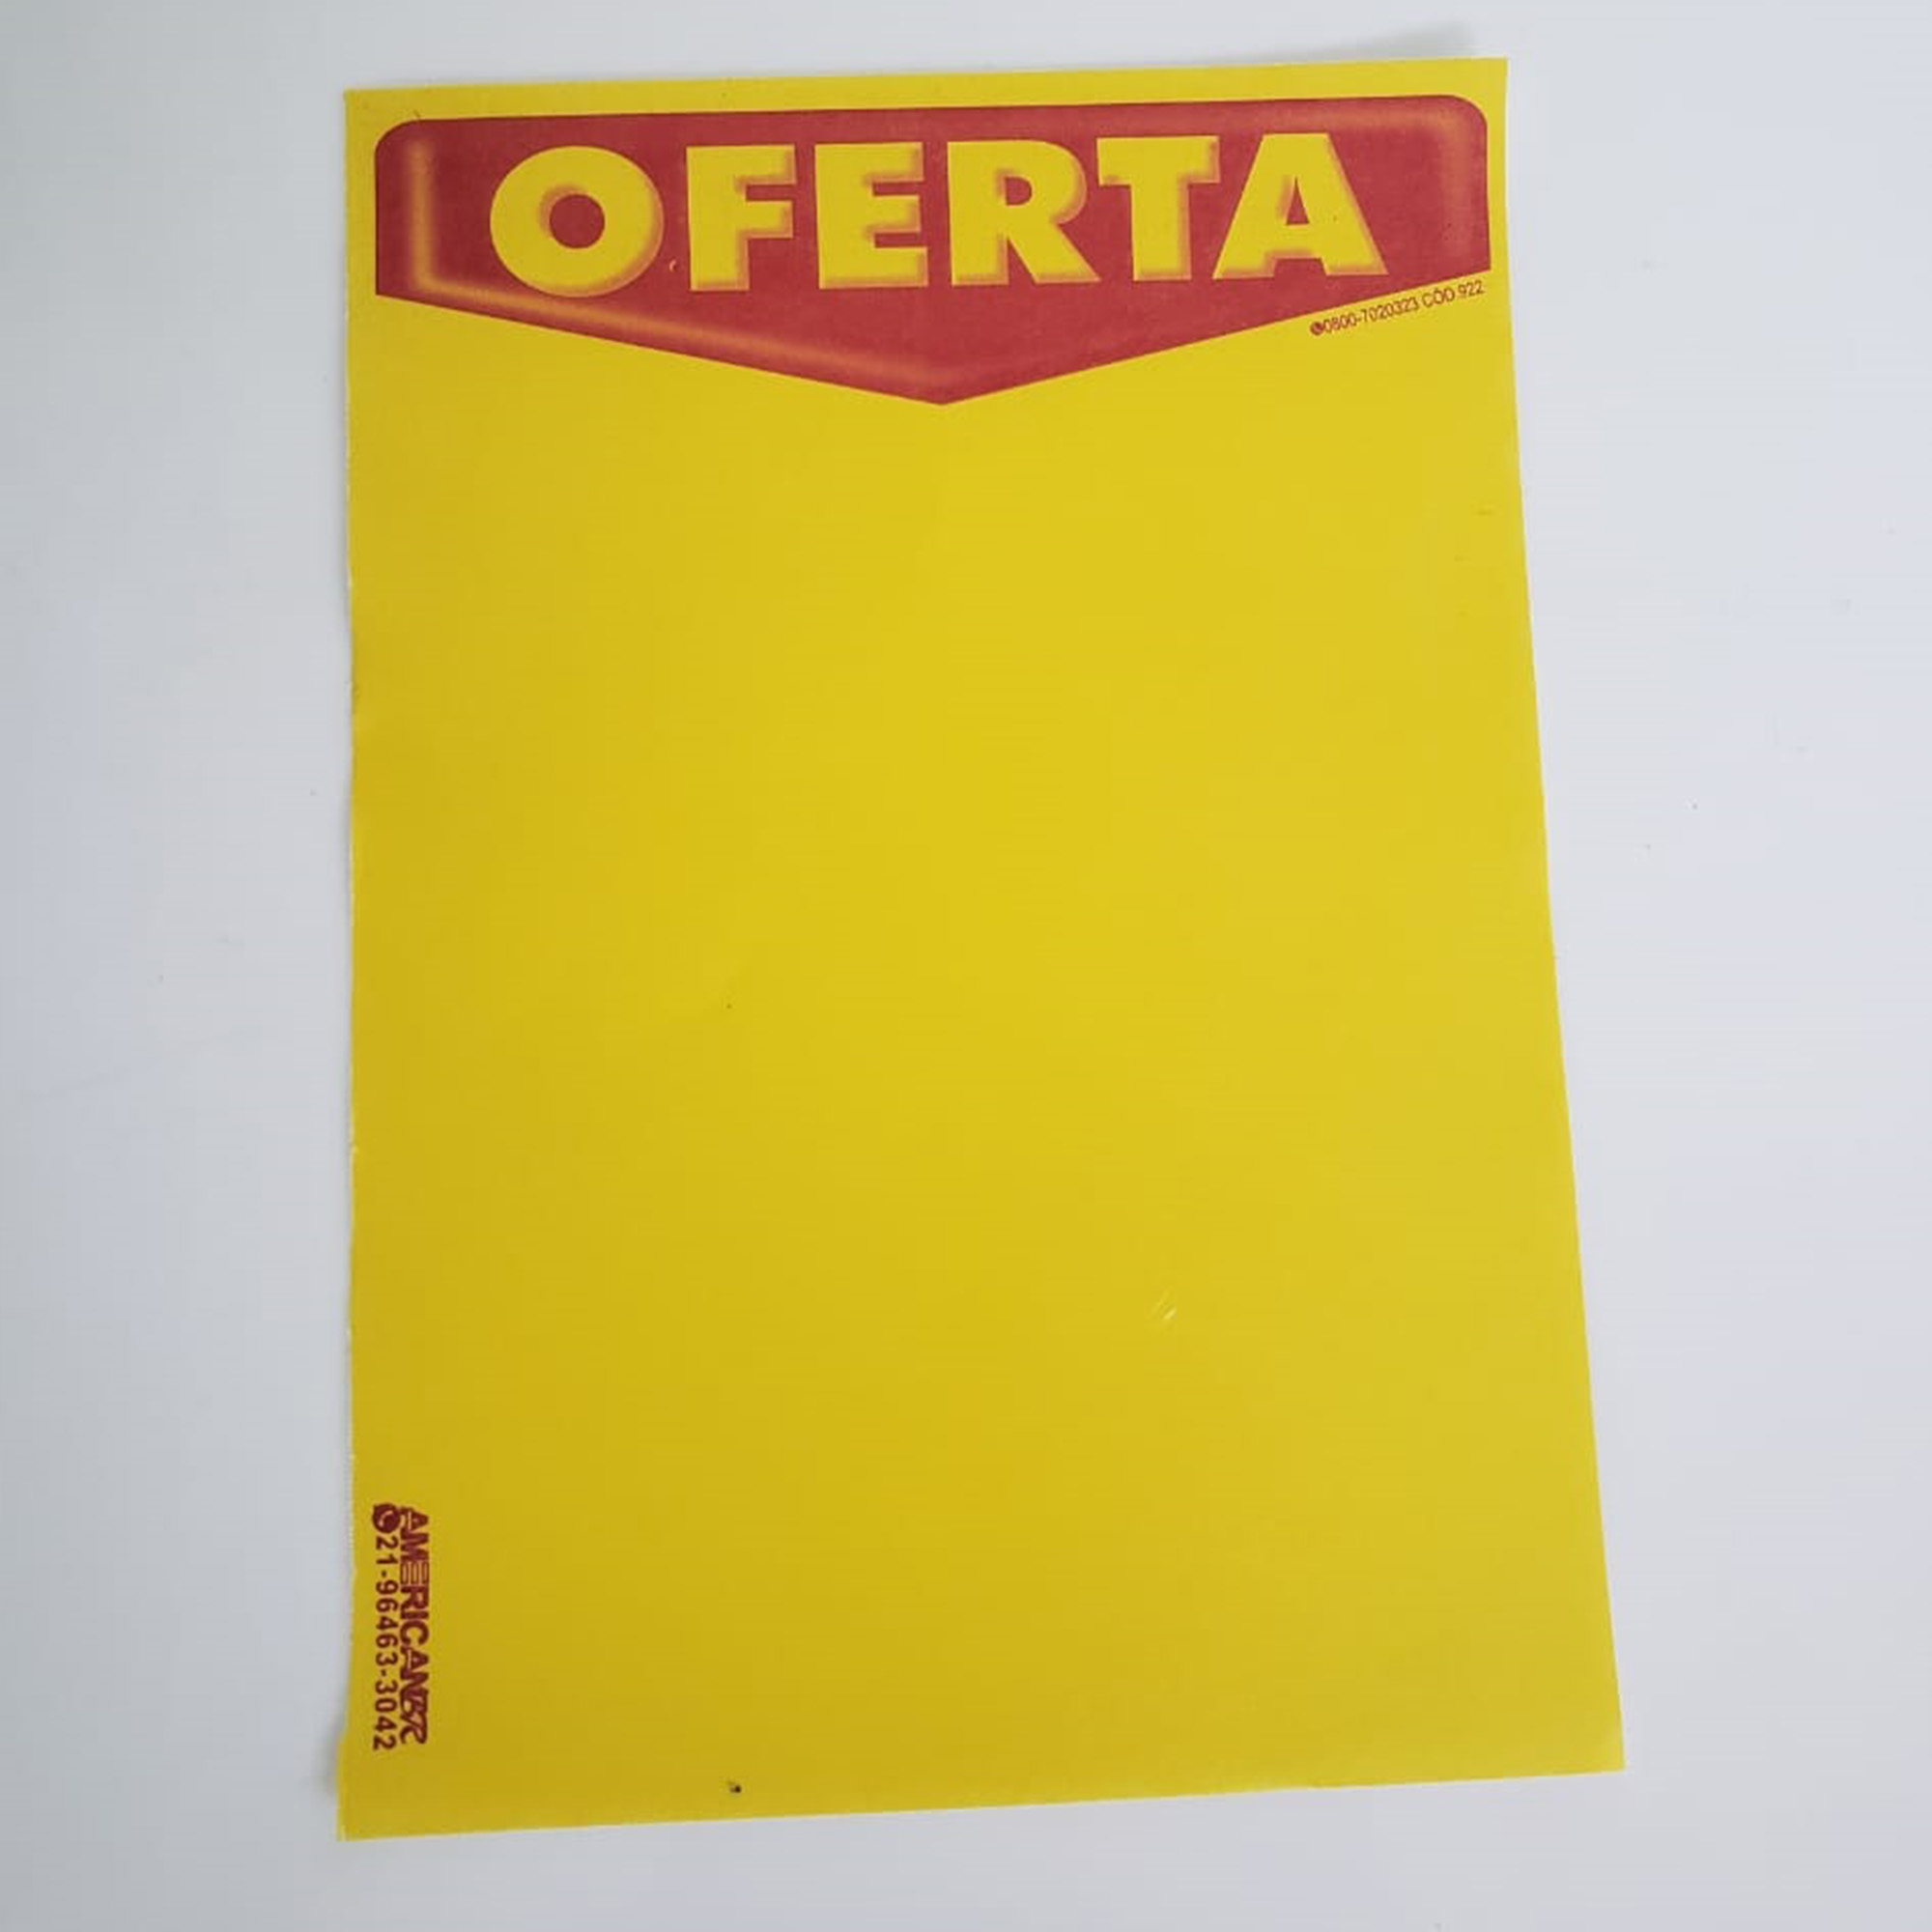 Mercado livre - (METIQ) KIT C/3 PINCEIS + TINTA KIT ESCRITA 500ML VERMELHO BASE DE ÁLCOOL + 50 CARTAZ OFERTA BRINDE